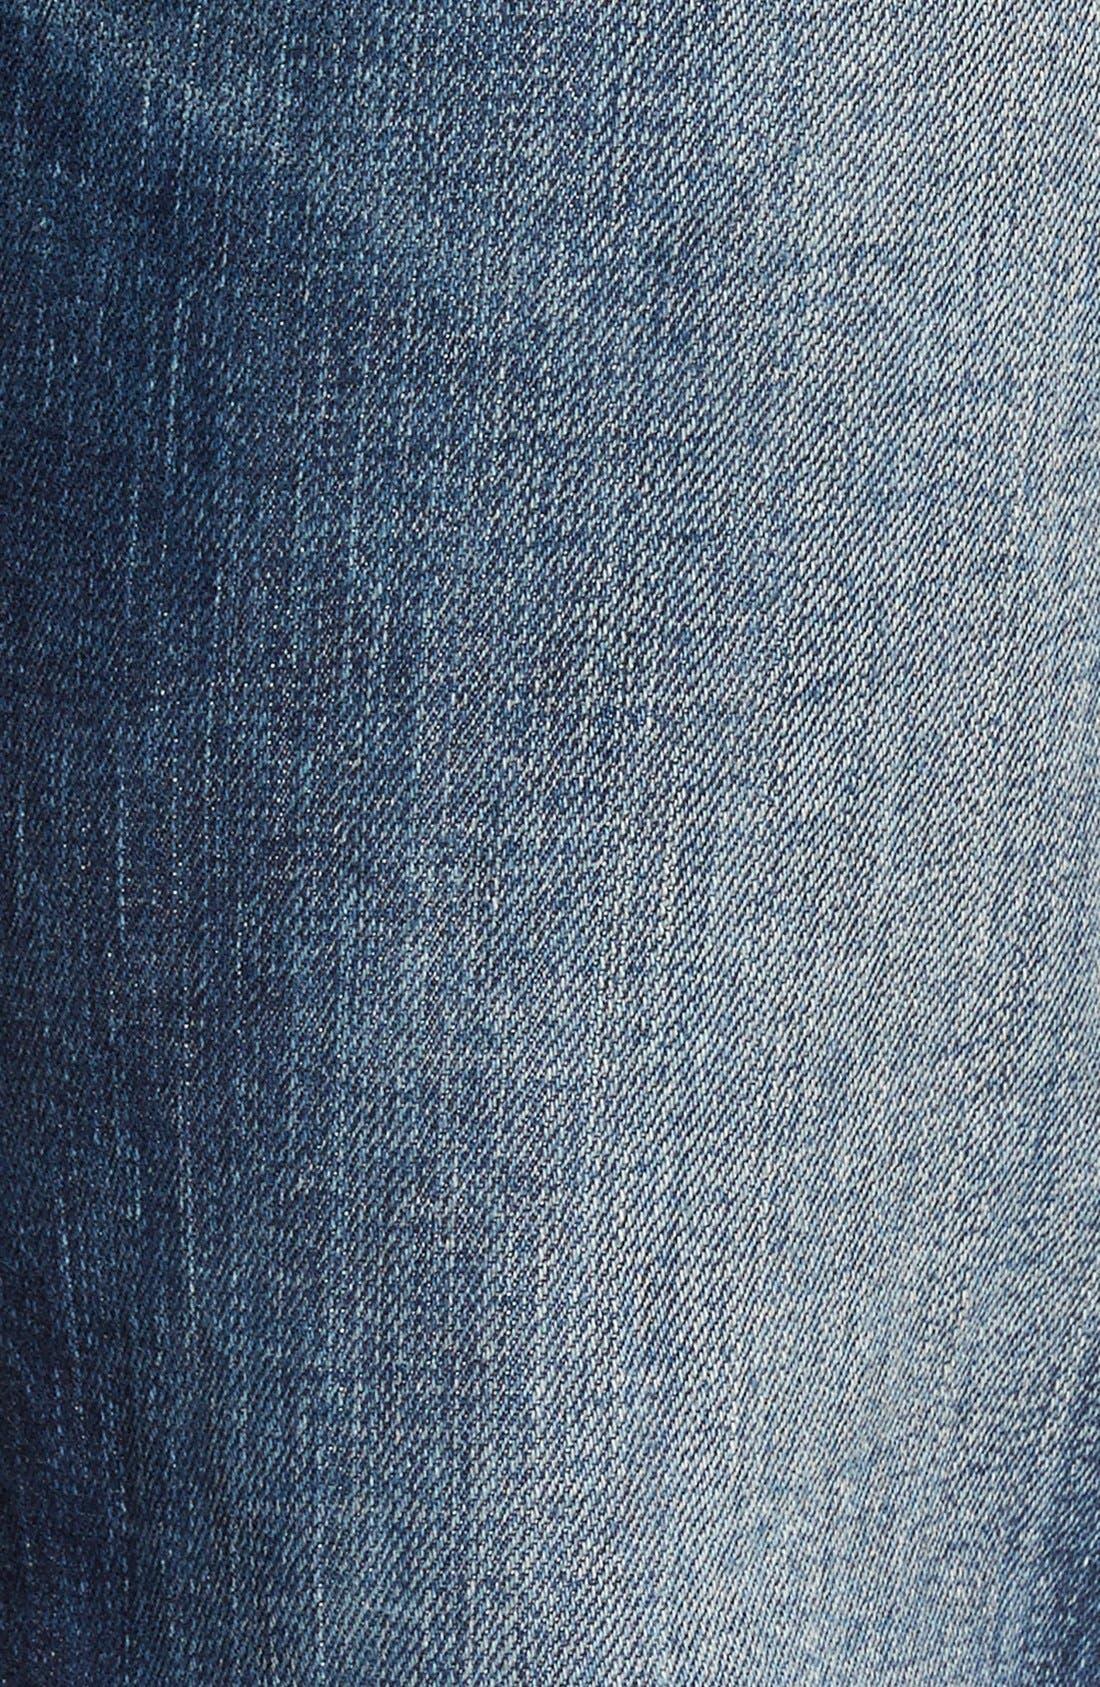 'Union' Straight Leg Jeans,                             Alternate thumbnail 5, color,                             423